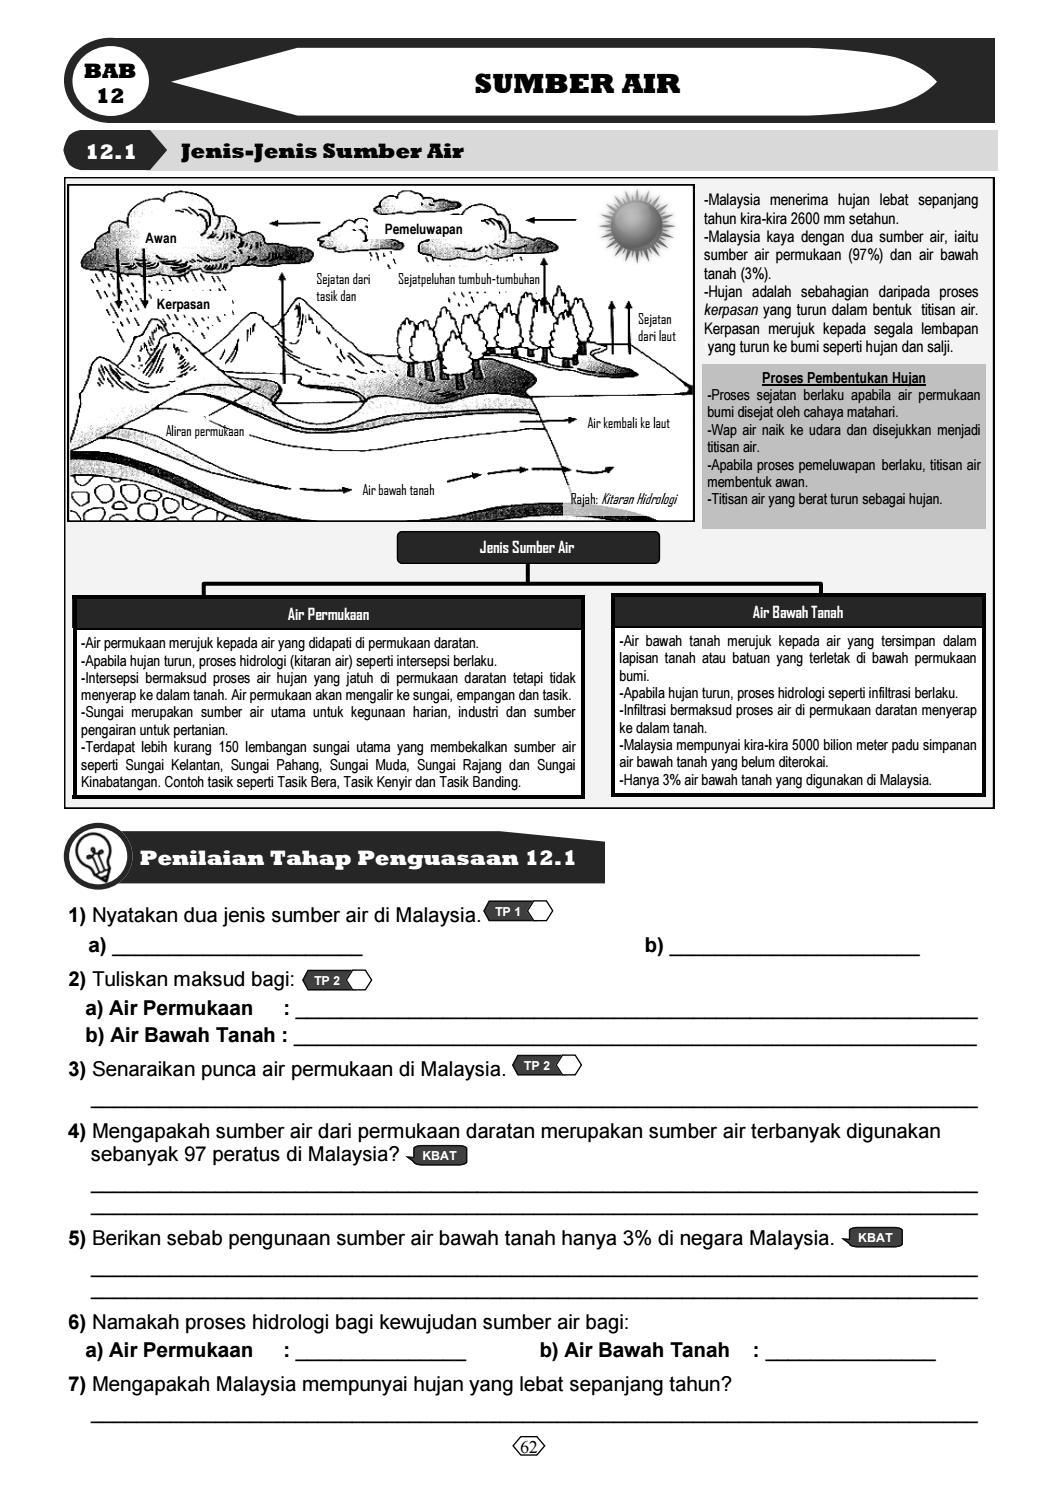 Sample Modul Geografi T1 By Buku Geografi Issuu